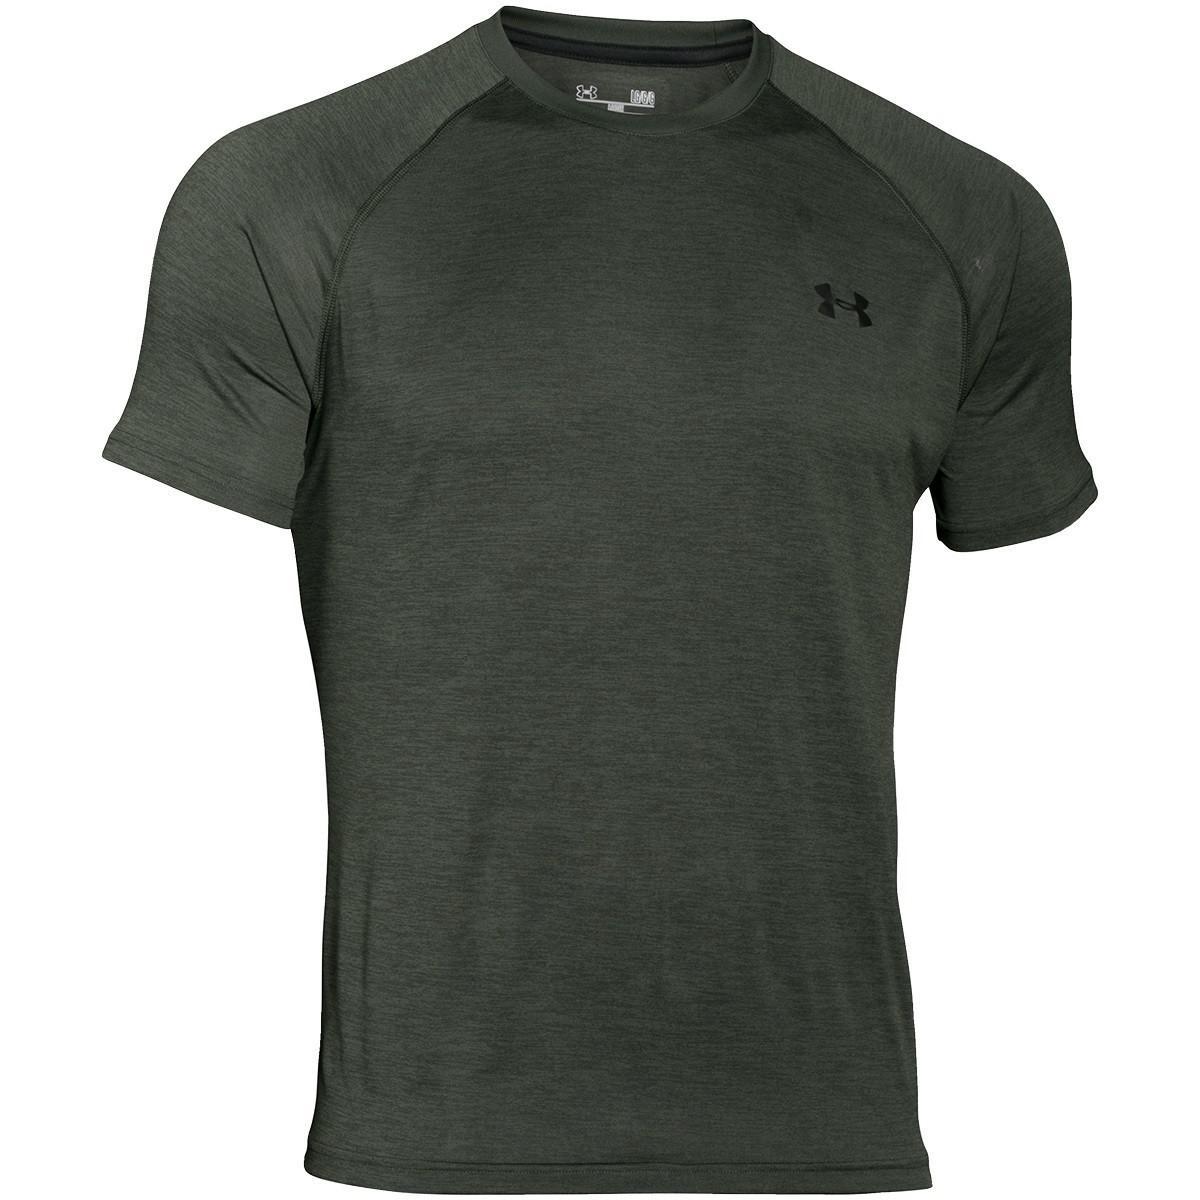 563dd35f Lyst - Under Armour Men Tech Short Sleeve T-shirt in Green for Men